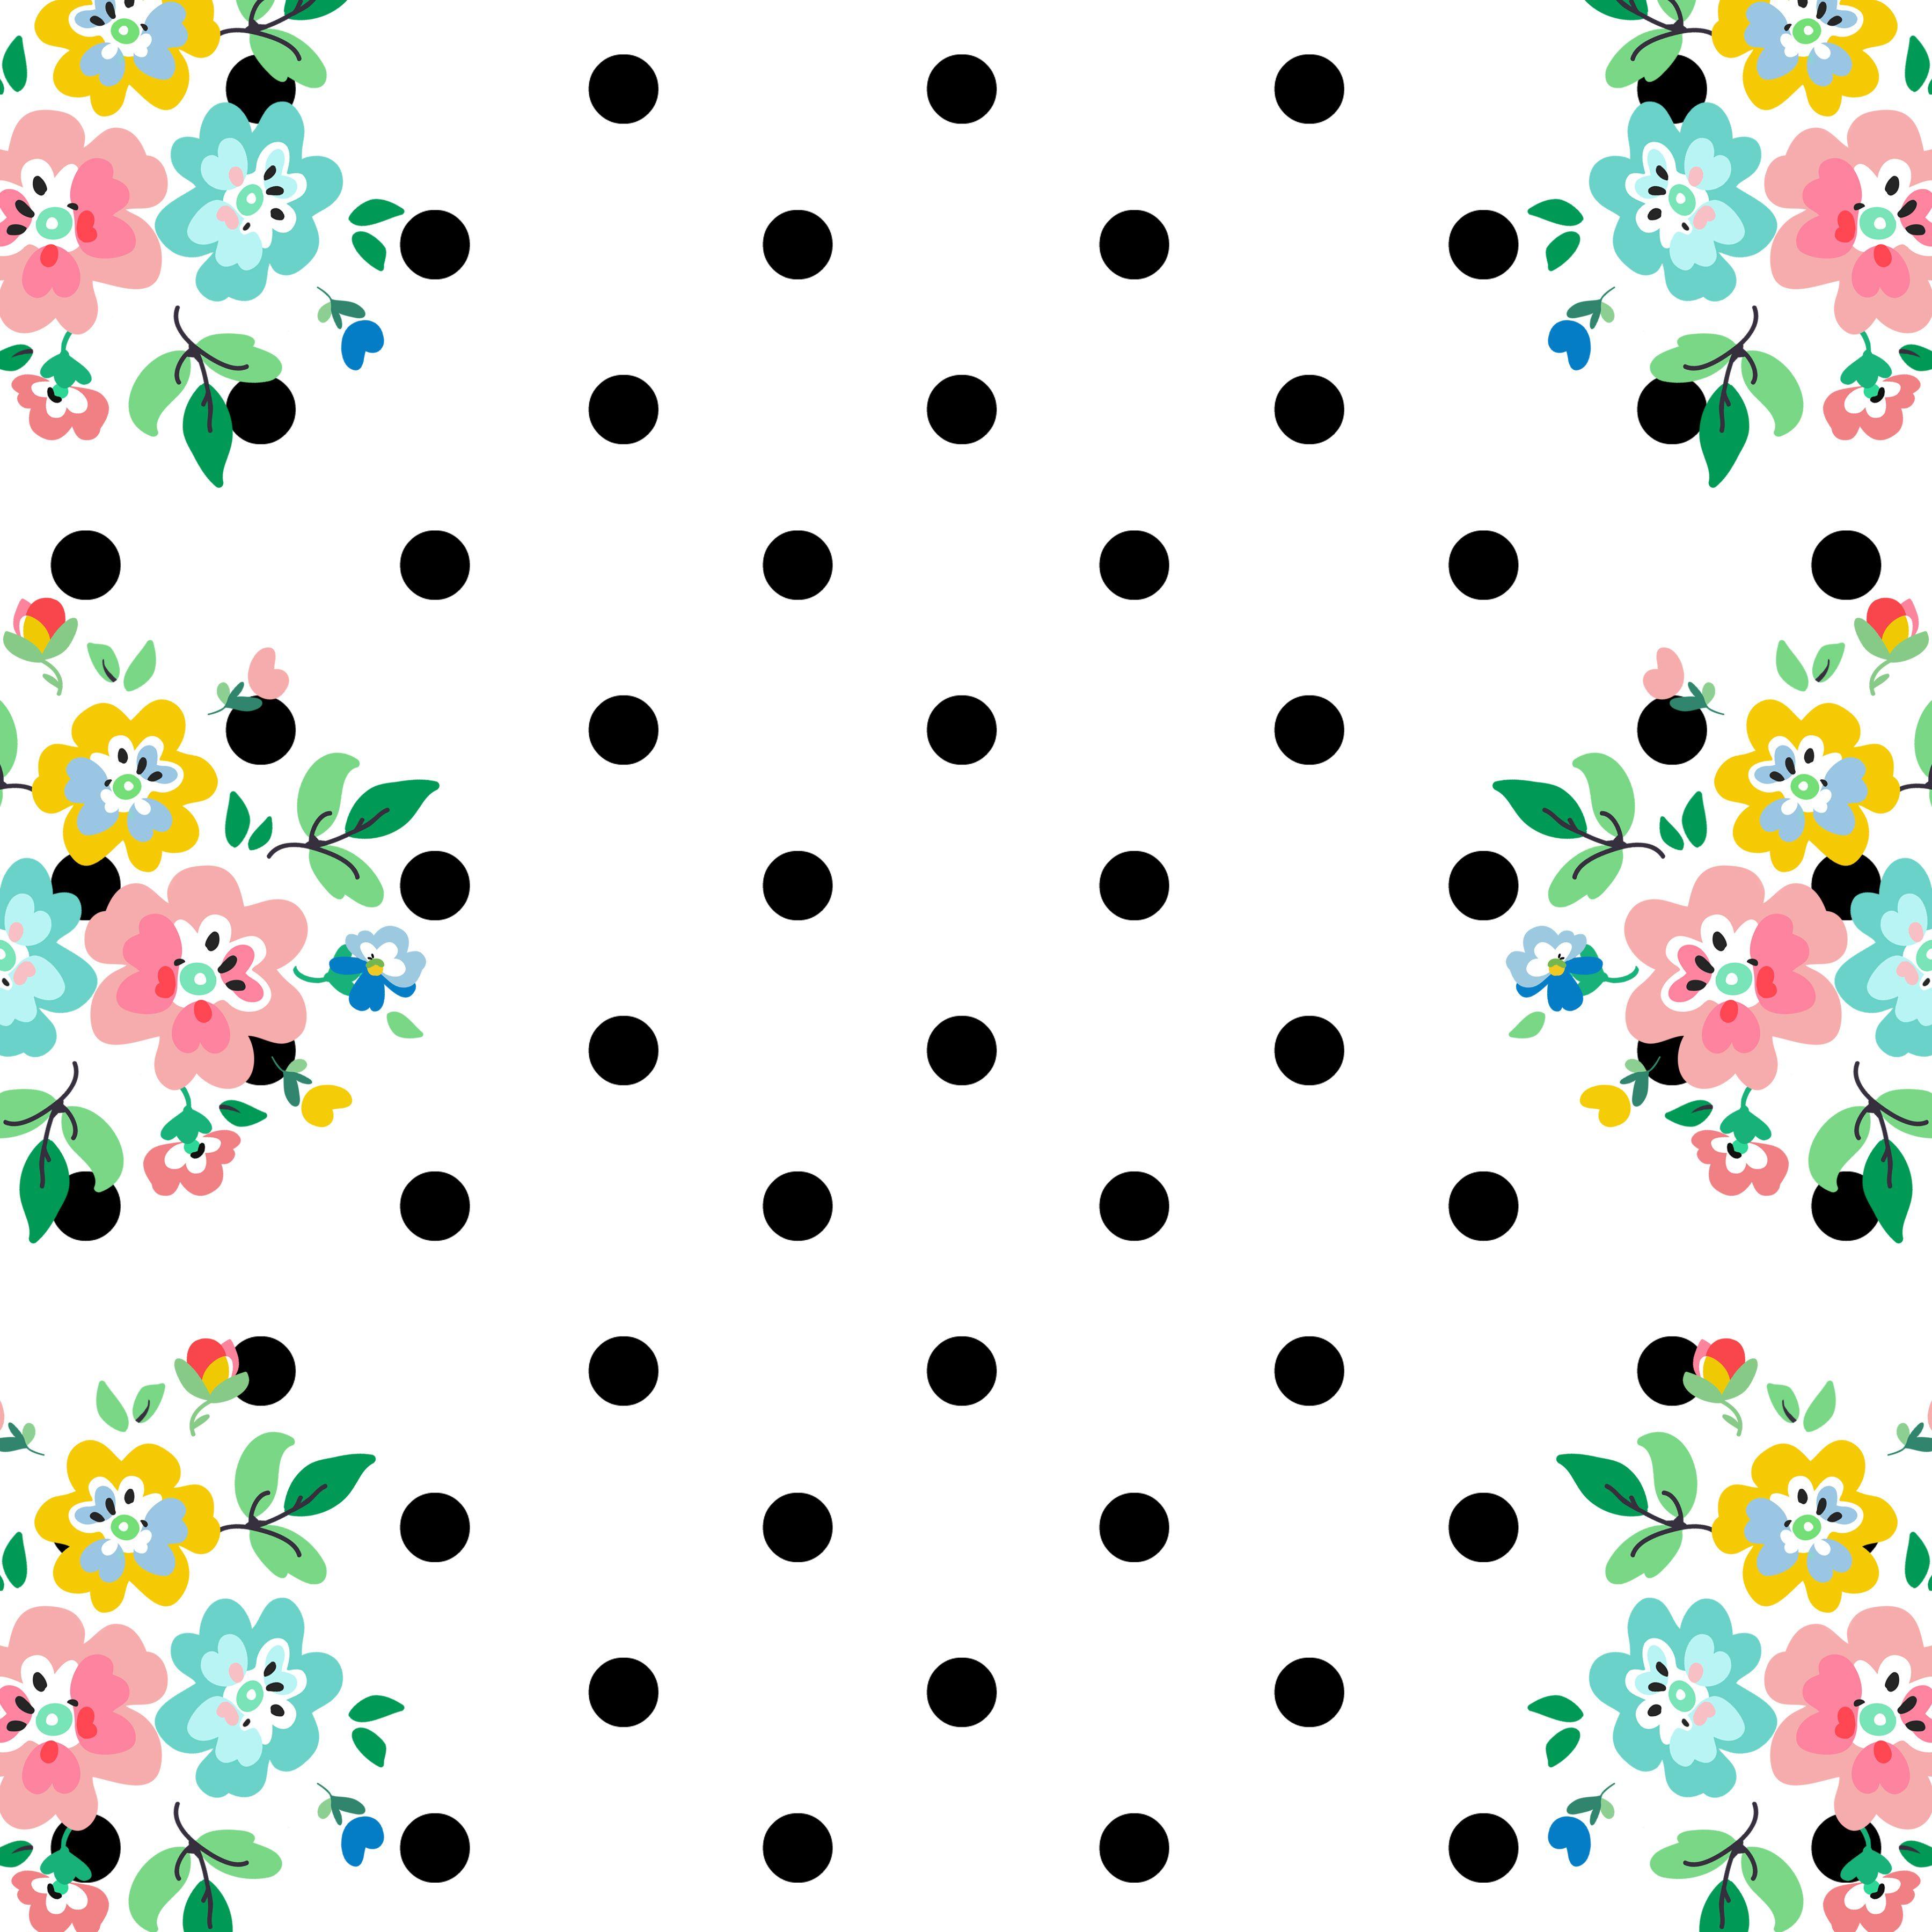 Free-digital-floral-polkadot-paper-FPTFY-3.jpg 3.600×3.600 piksel